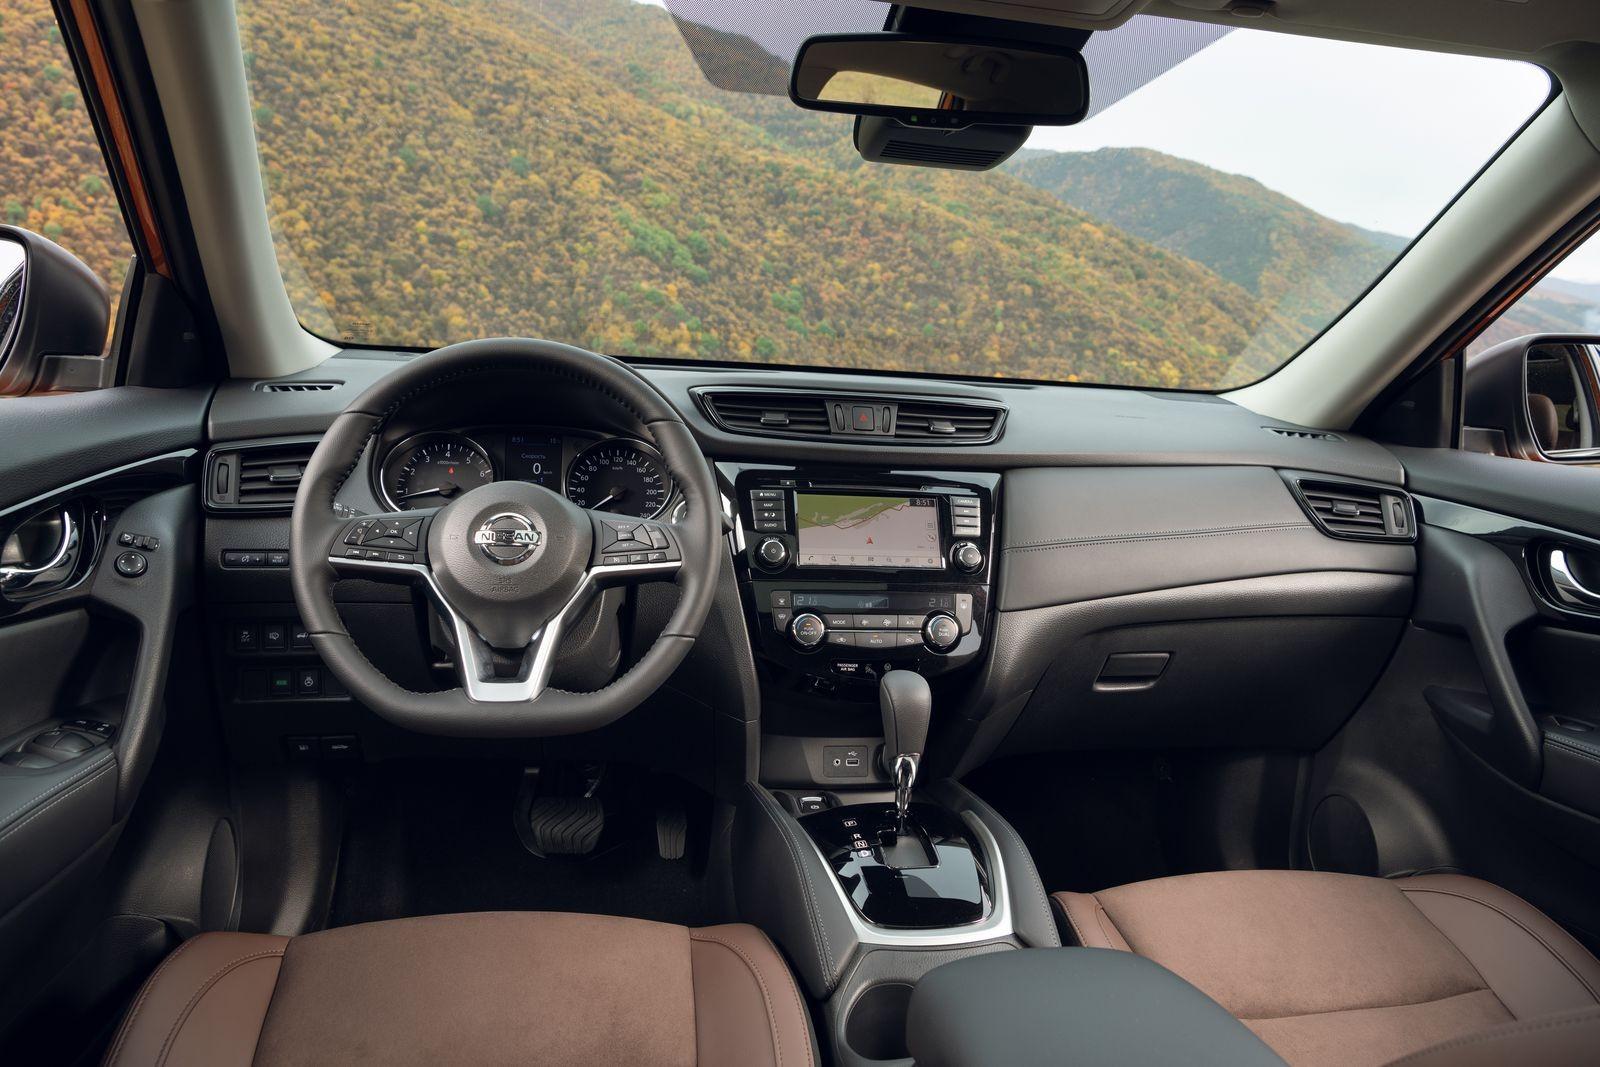 Тем, кто любит «Яндекс»: тест-драйв обновленных Nissan Qashqai и X-Trail